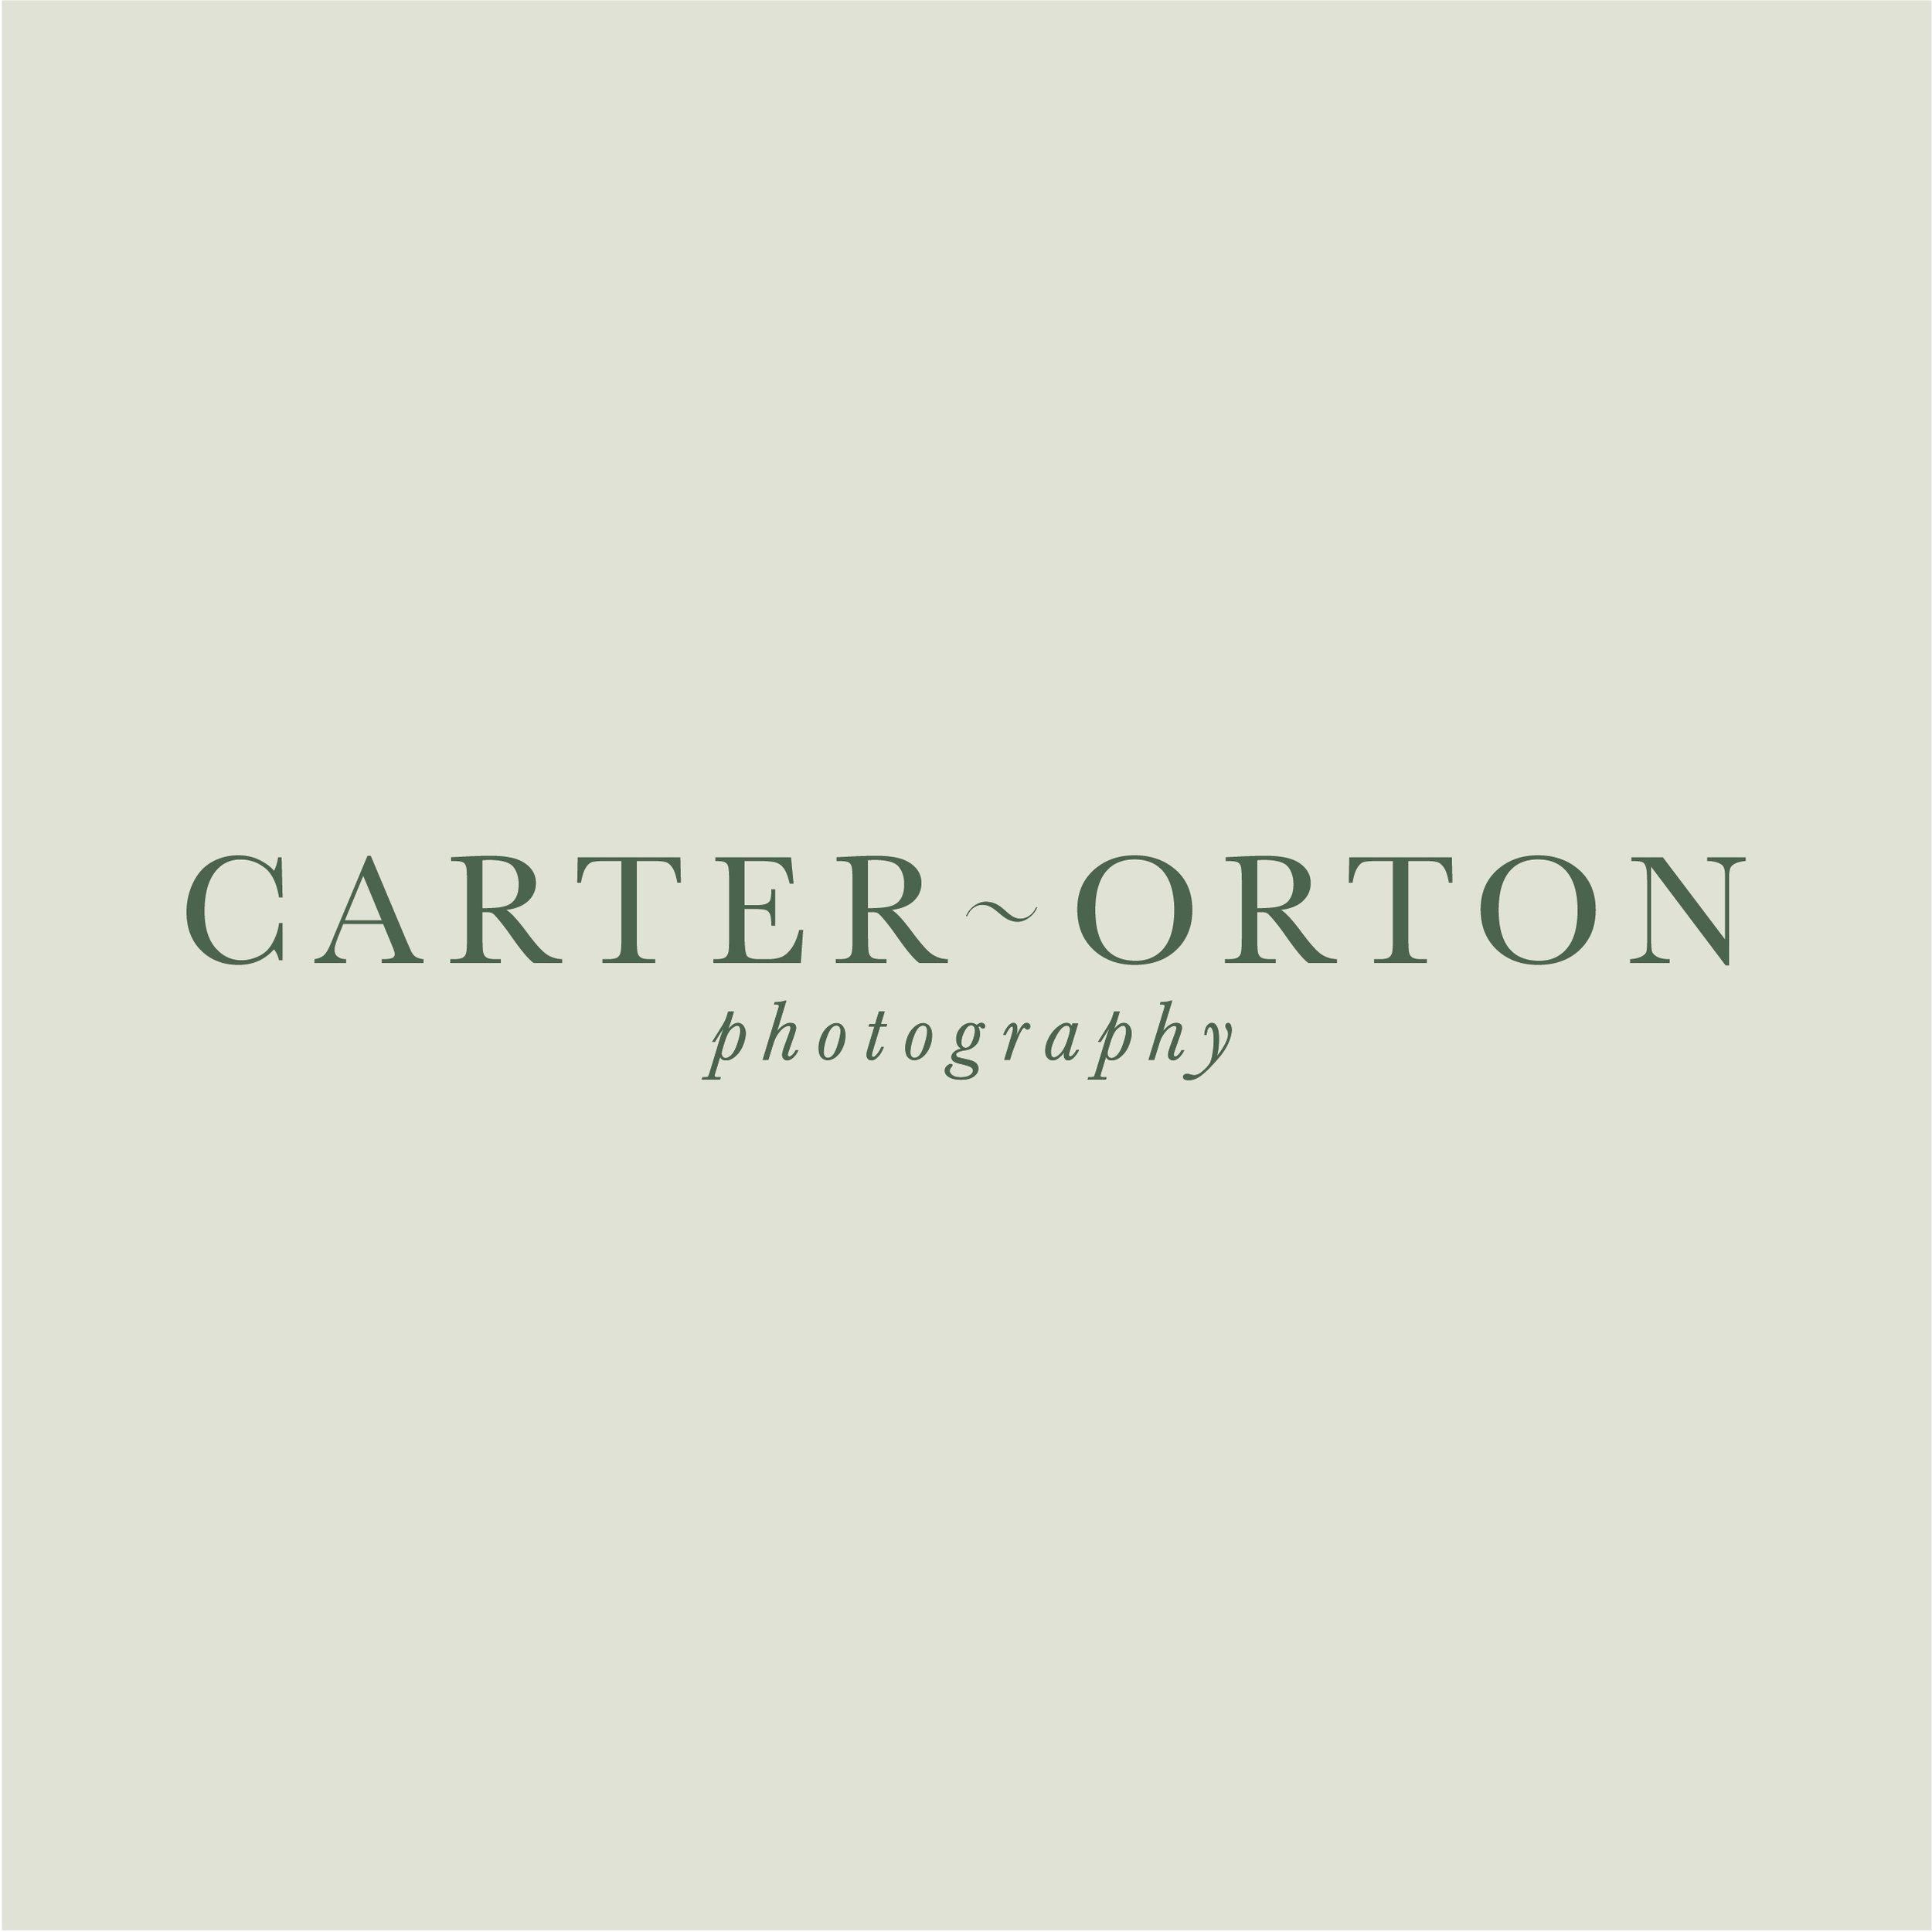 01_carter_orton_photography_rebrand_manual-06.jpg